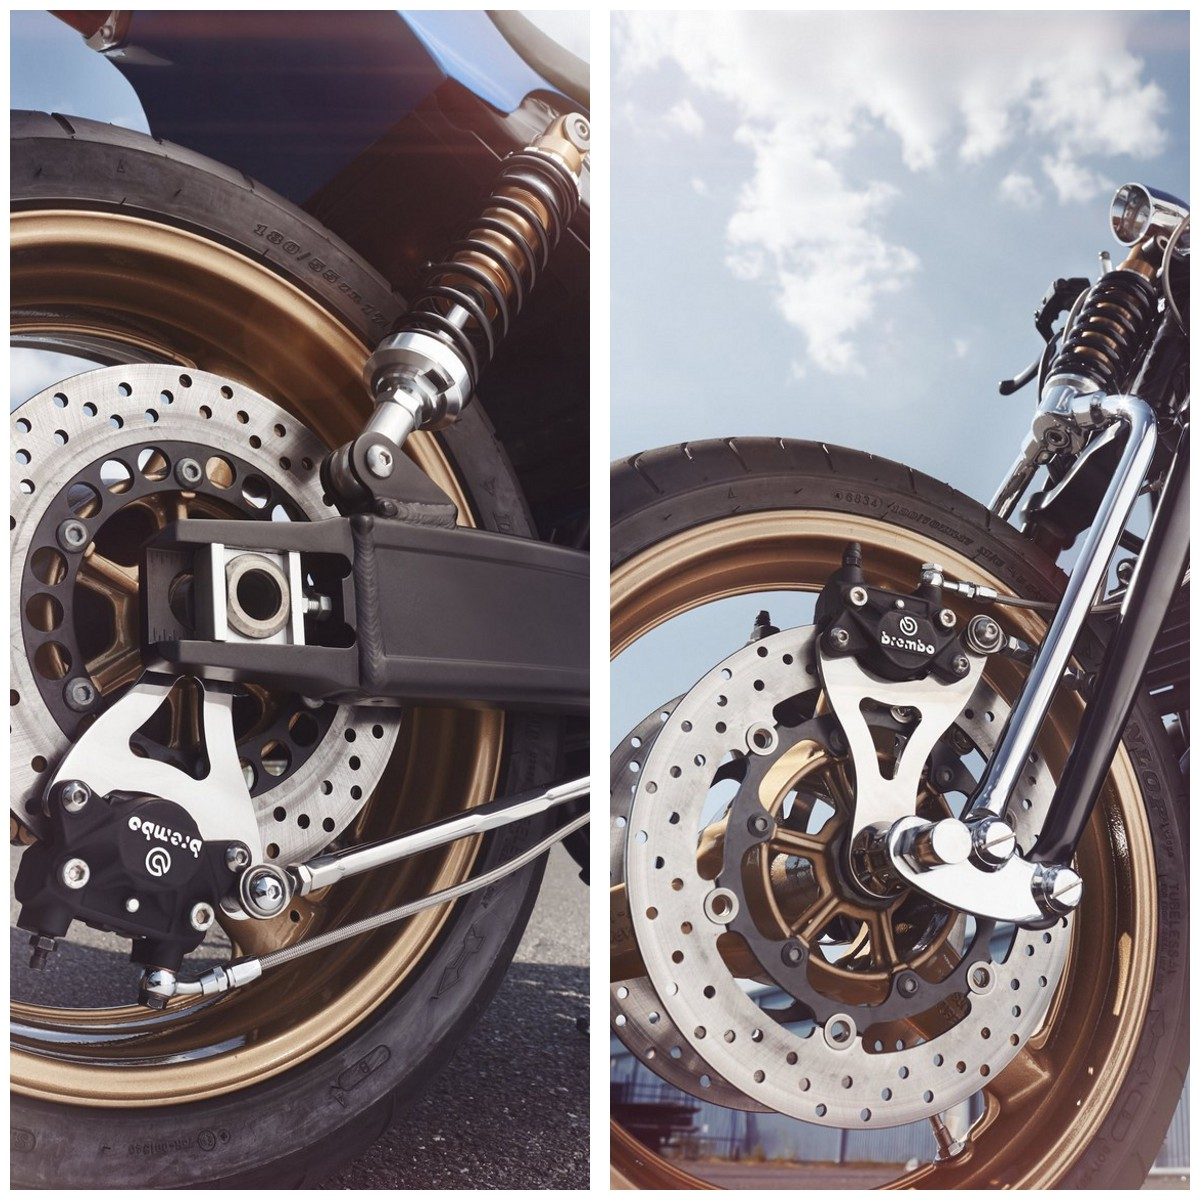 motorcycle modification yamaha bikes xjr 1300 cafe racer. Black Bedroom Furniture Sets. Home Design Ideas